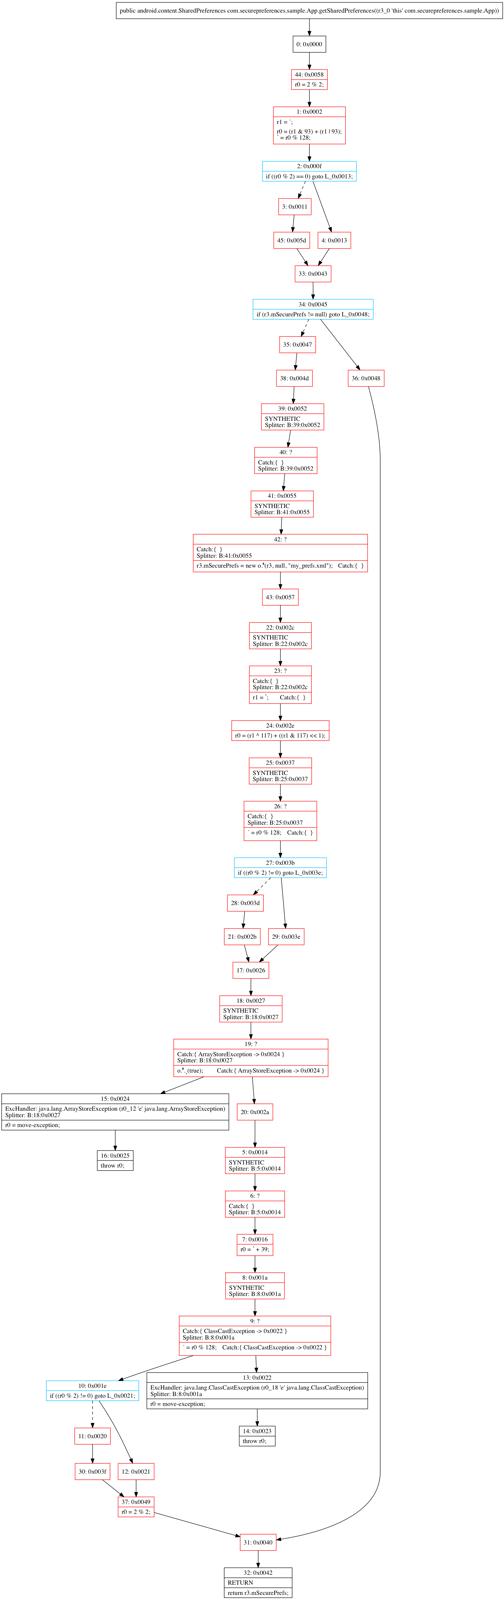 dexguard obfuscates control flow